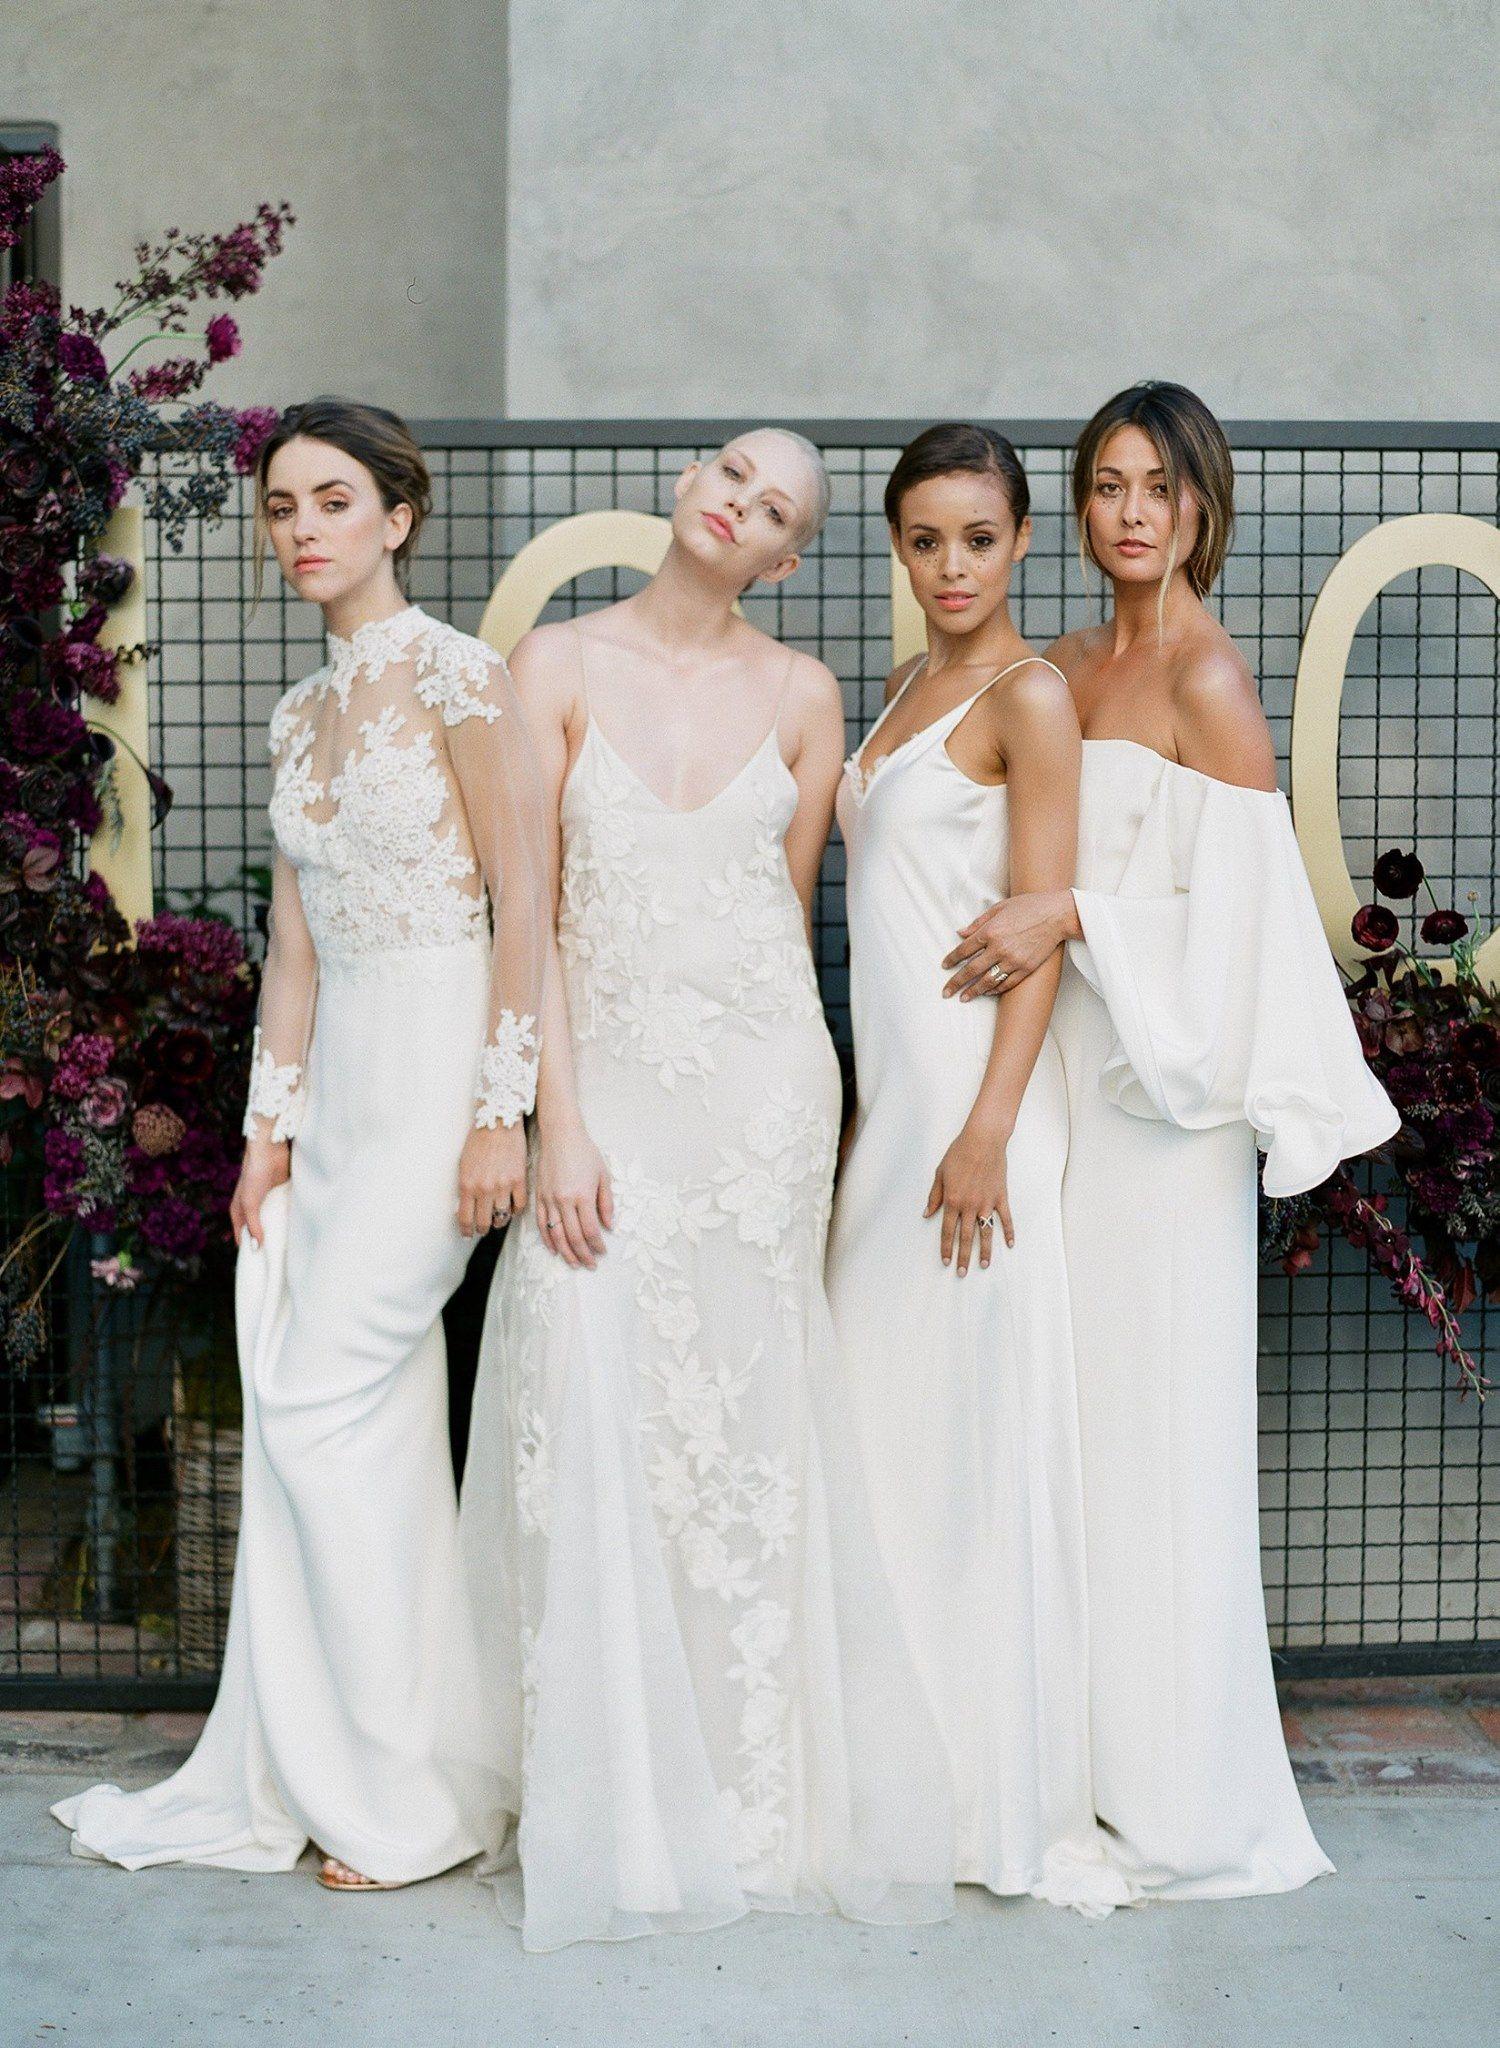 Loho Bride Los Angeles Www Lohobride Com Wedding Dress Styles